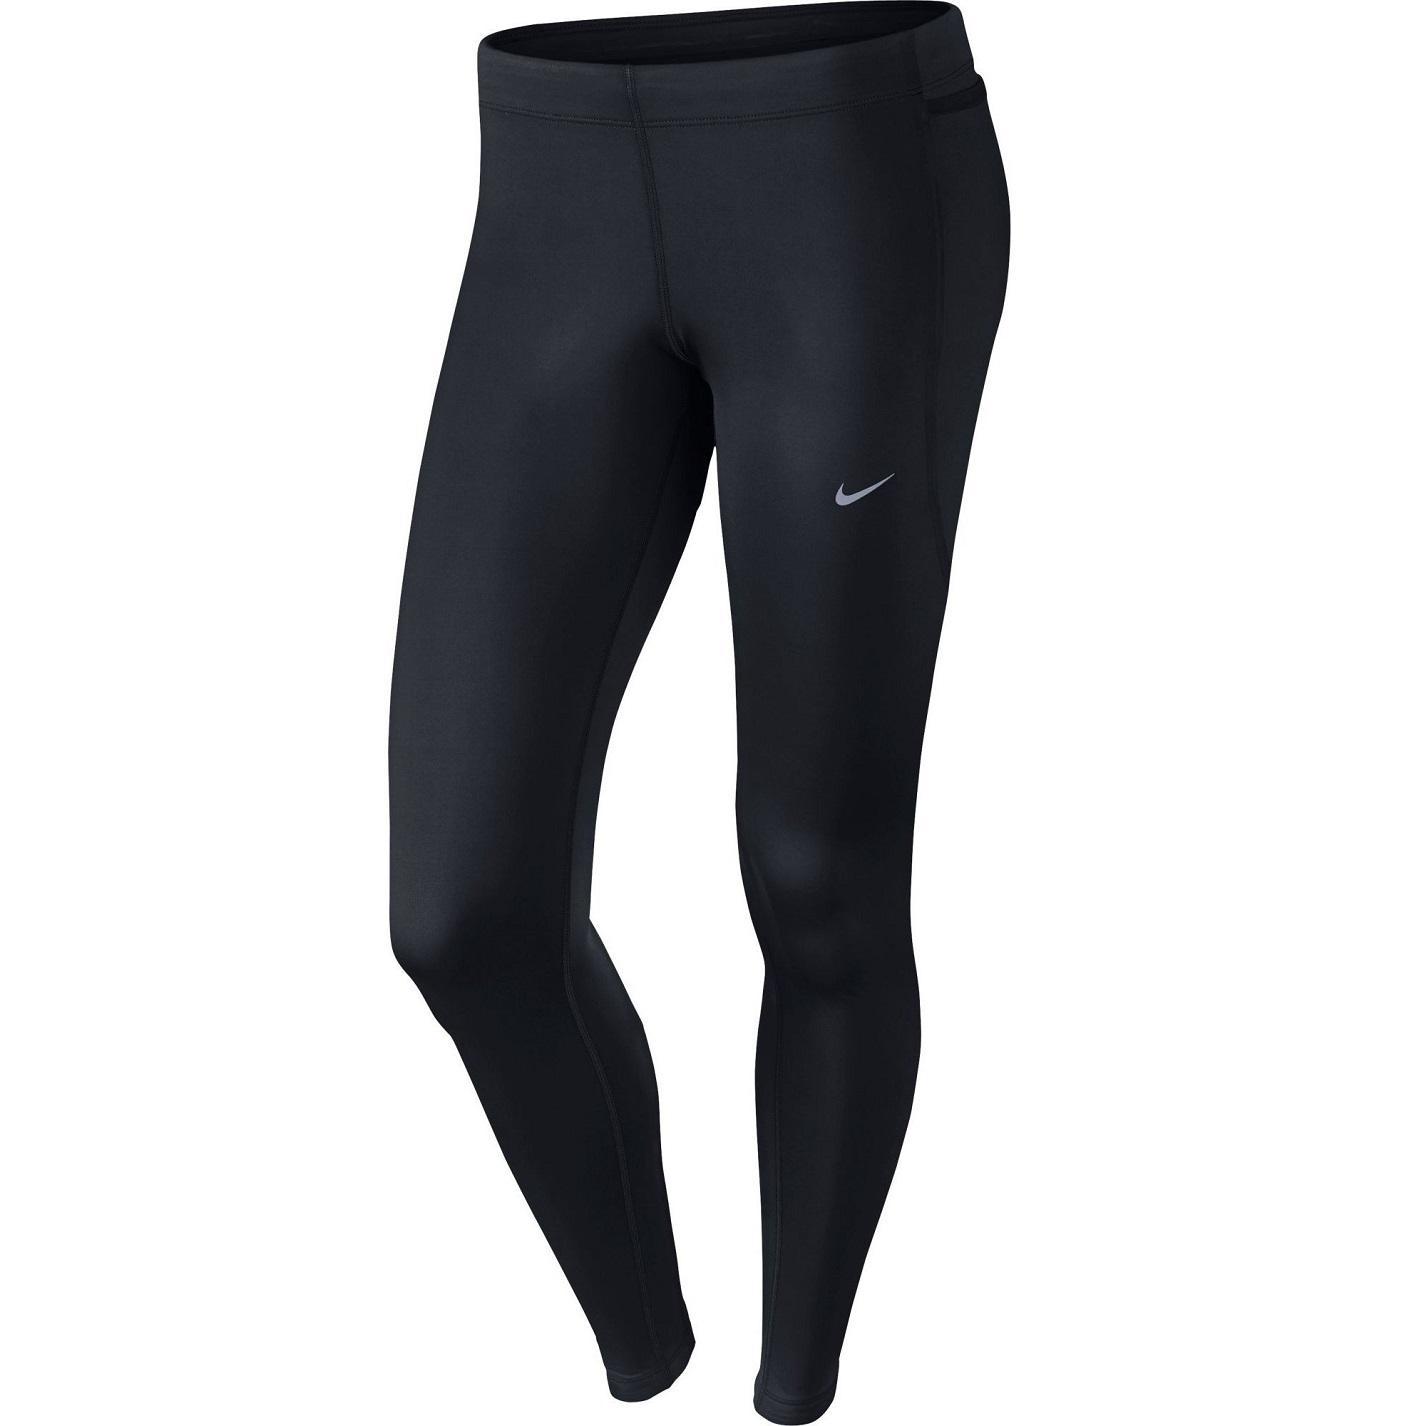 5aa6e0d18f Buy Nike Sports Shorts and Pants Singapore | Lazada